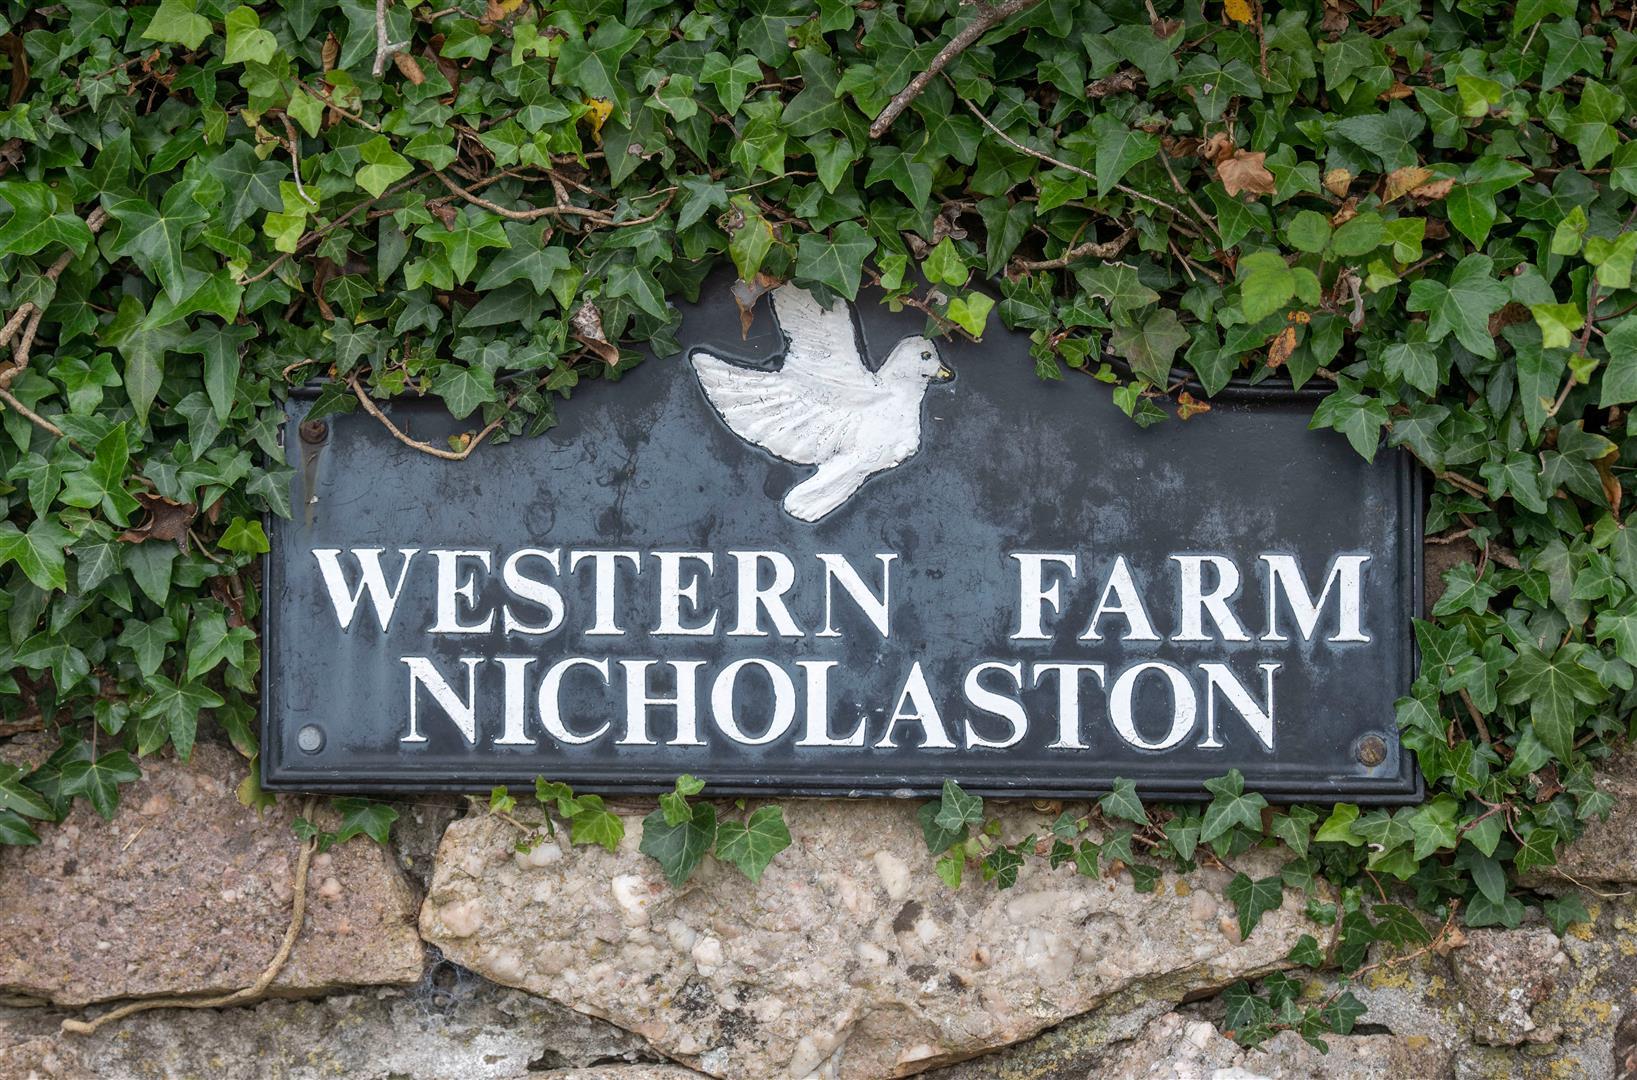 Western Farm, Nicholaston, Swansea, SA3 2HL